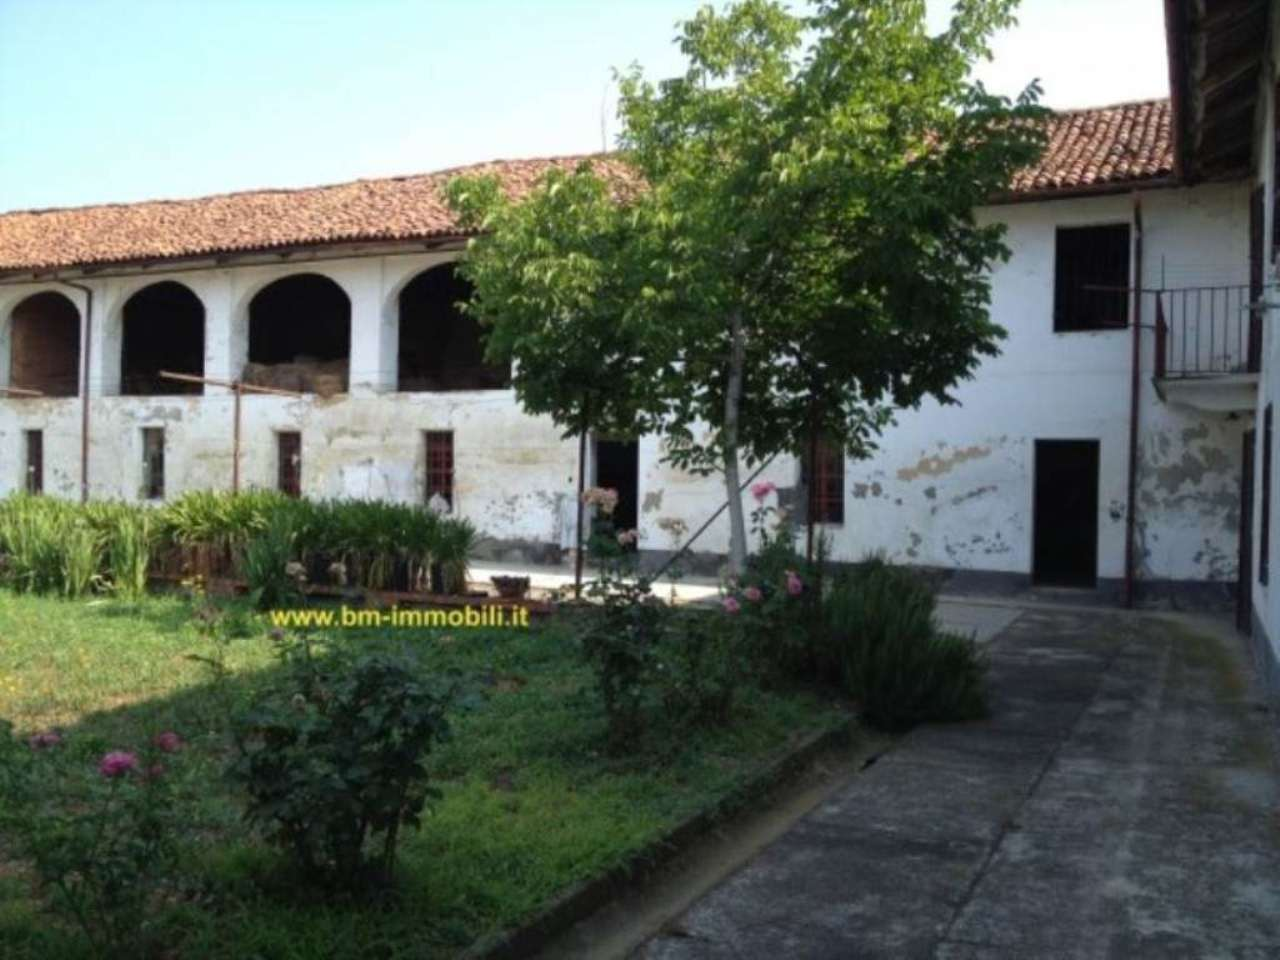 Villafranca d'Asti Vendita CASALE / RUSTICO / CASA / CASCINA Immagine 0